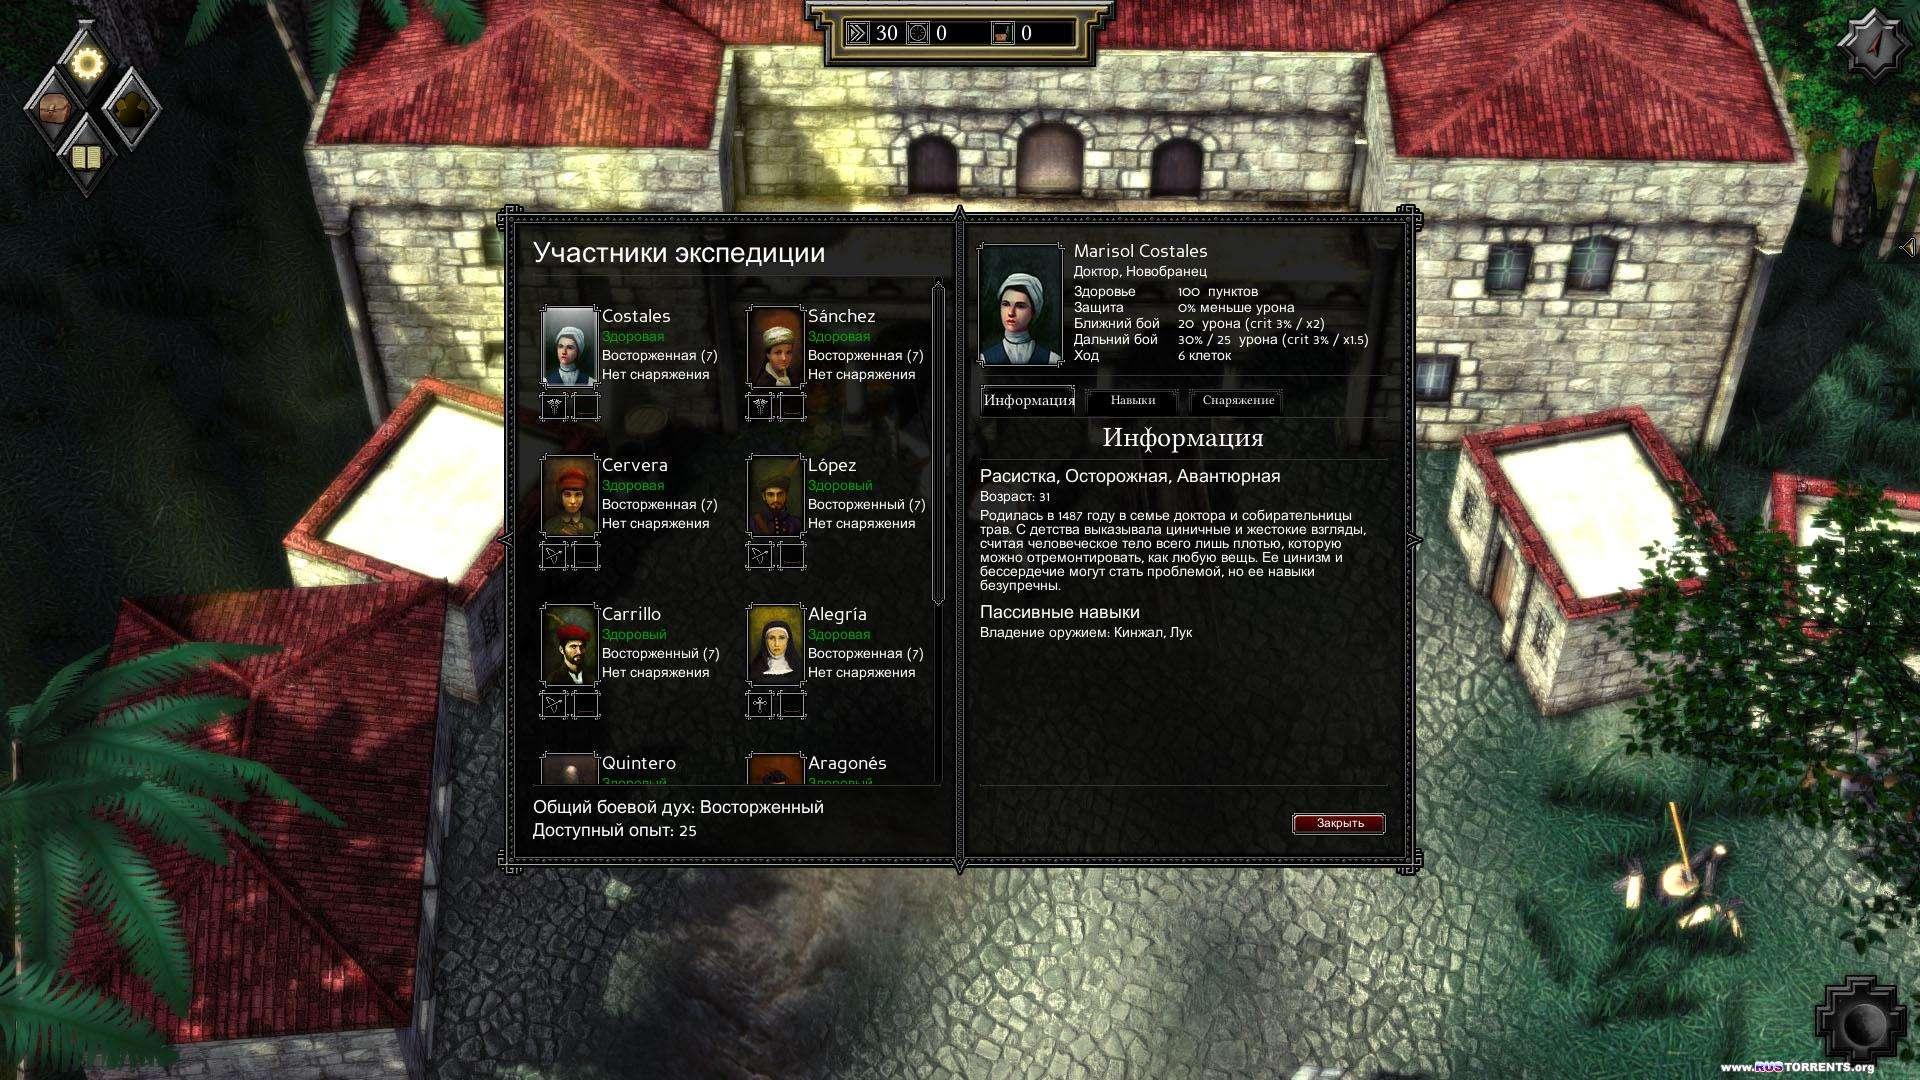 Expeditions: Conquistador [v 1.6.5] | �� | RePack �� Audioslave